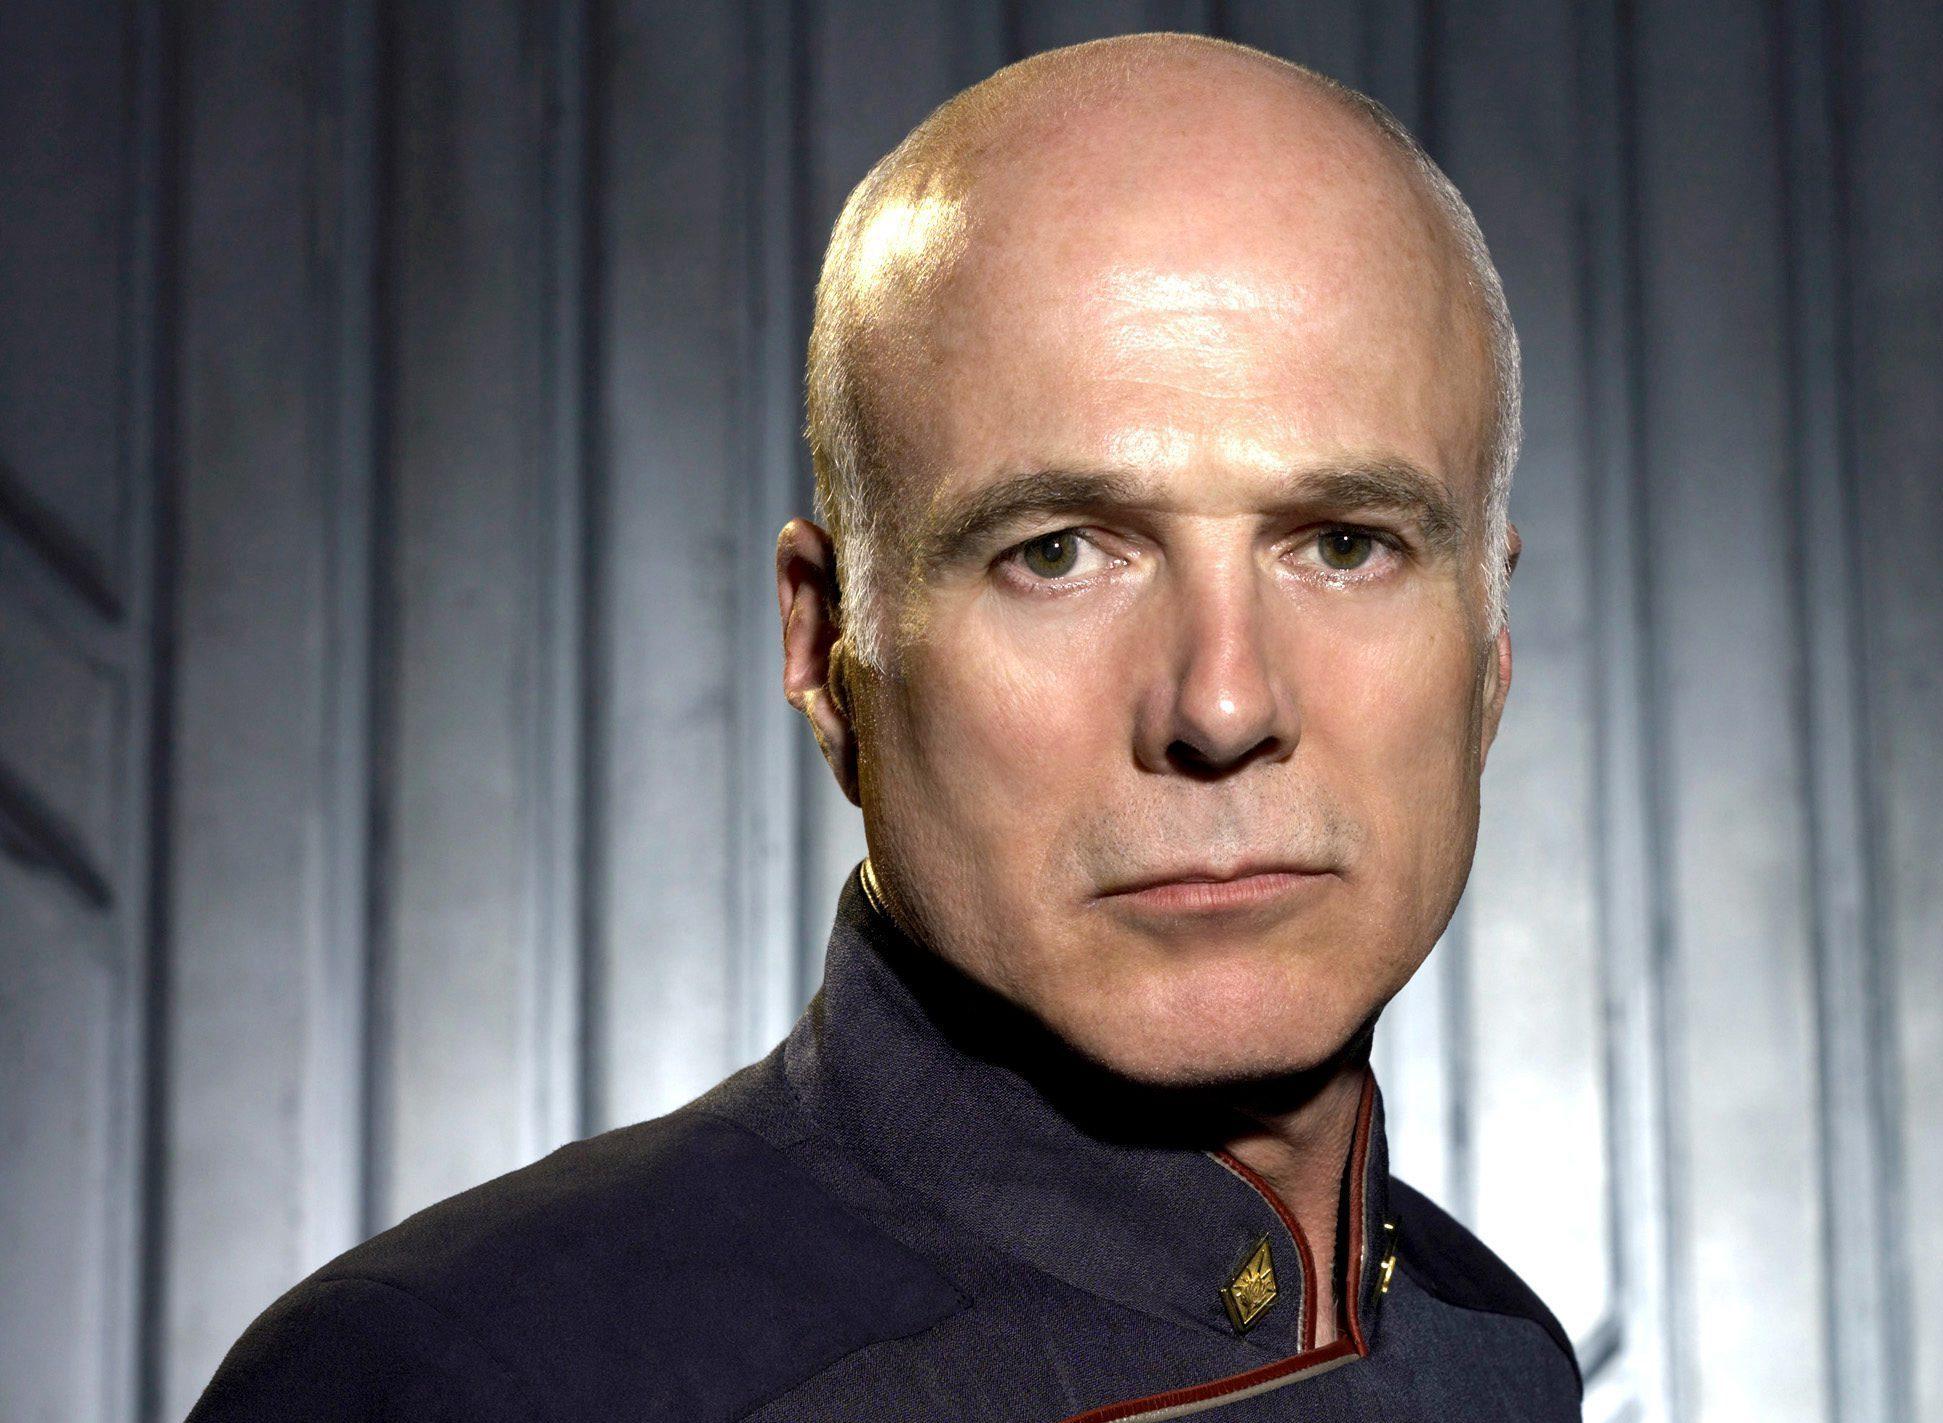 'Battlestar Galactica' star Michael Hogan injured in serious fall, GoFundMe started for health care